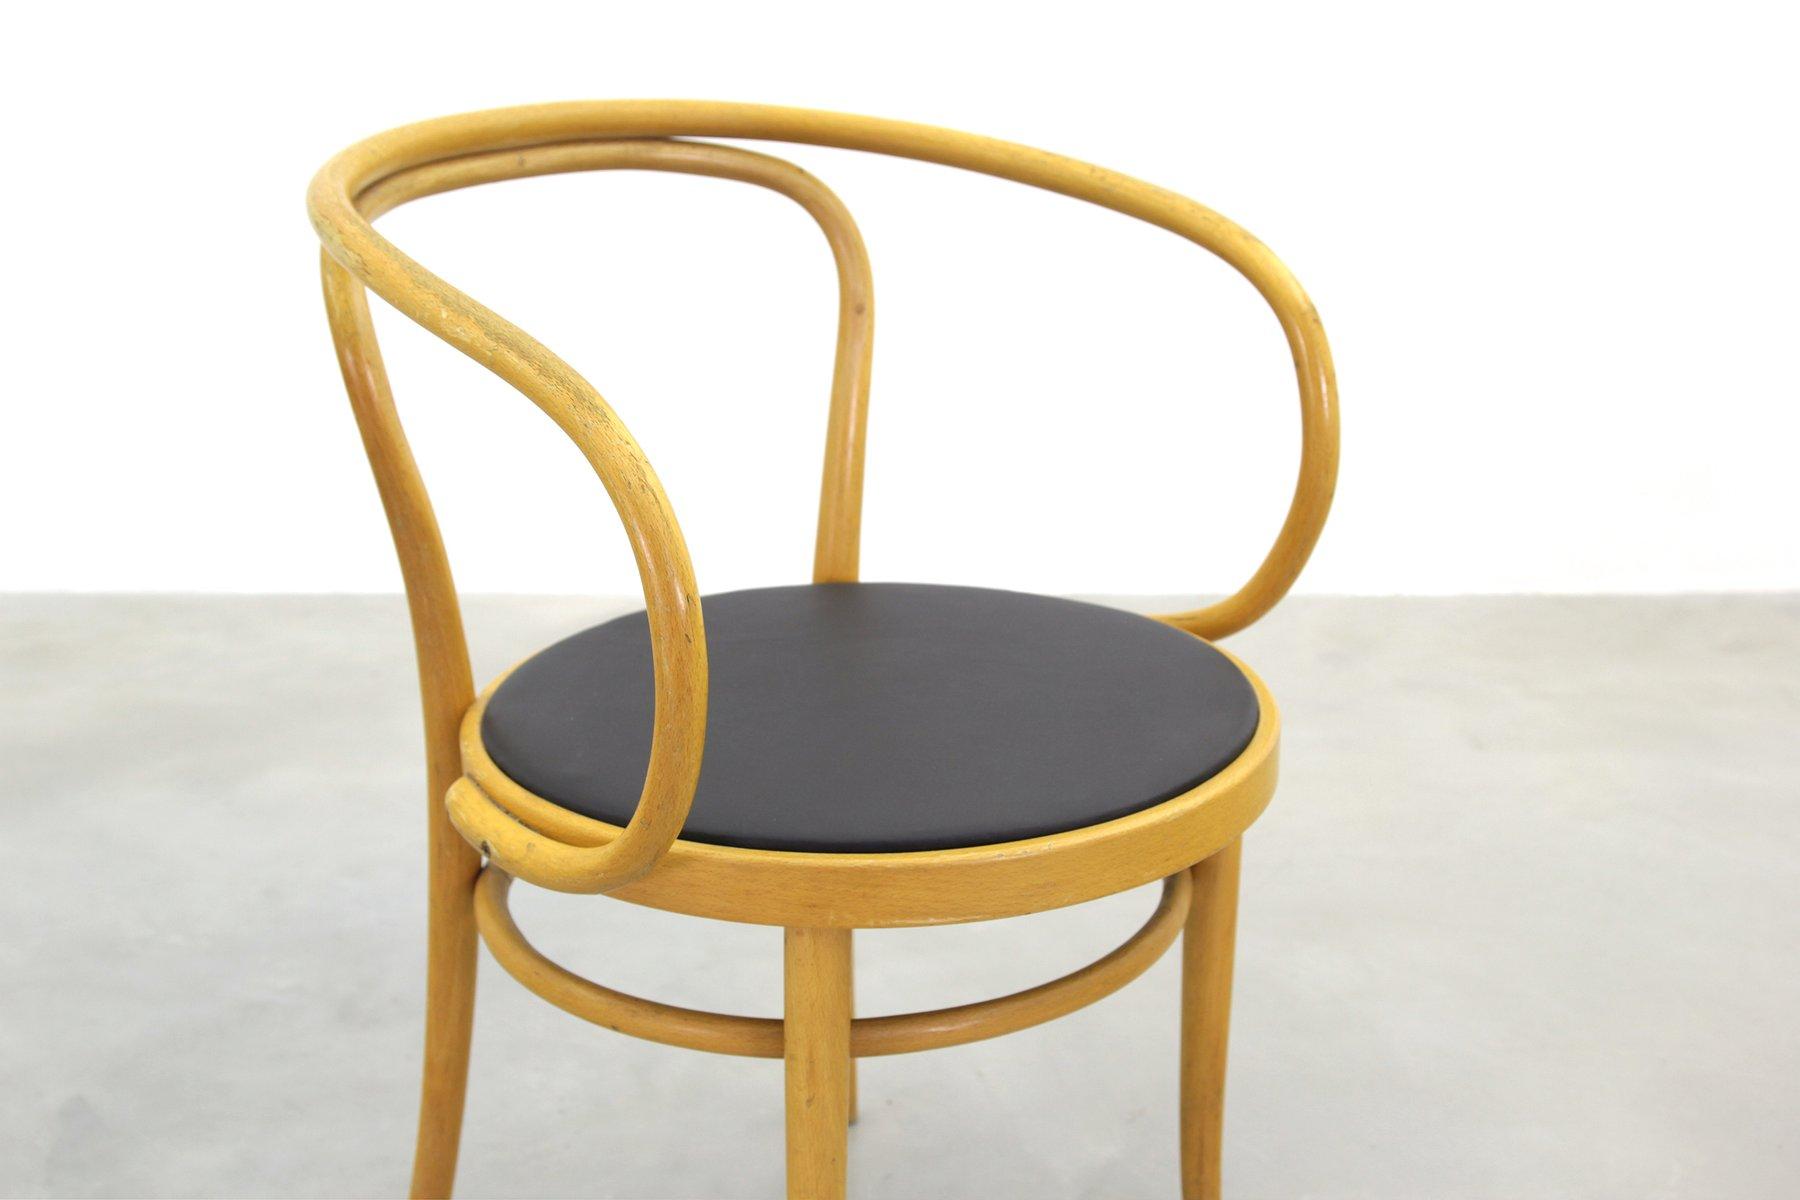 modell 209 thonet stuhl von le corbusier f r thonet 1982. Black Bedroom Furniture Sets. Home Design Ideas